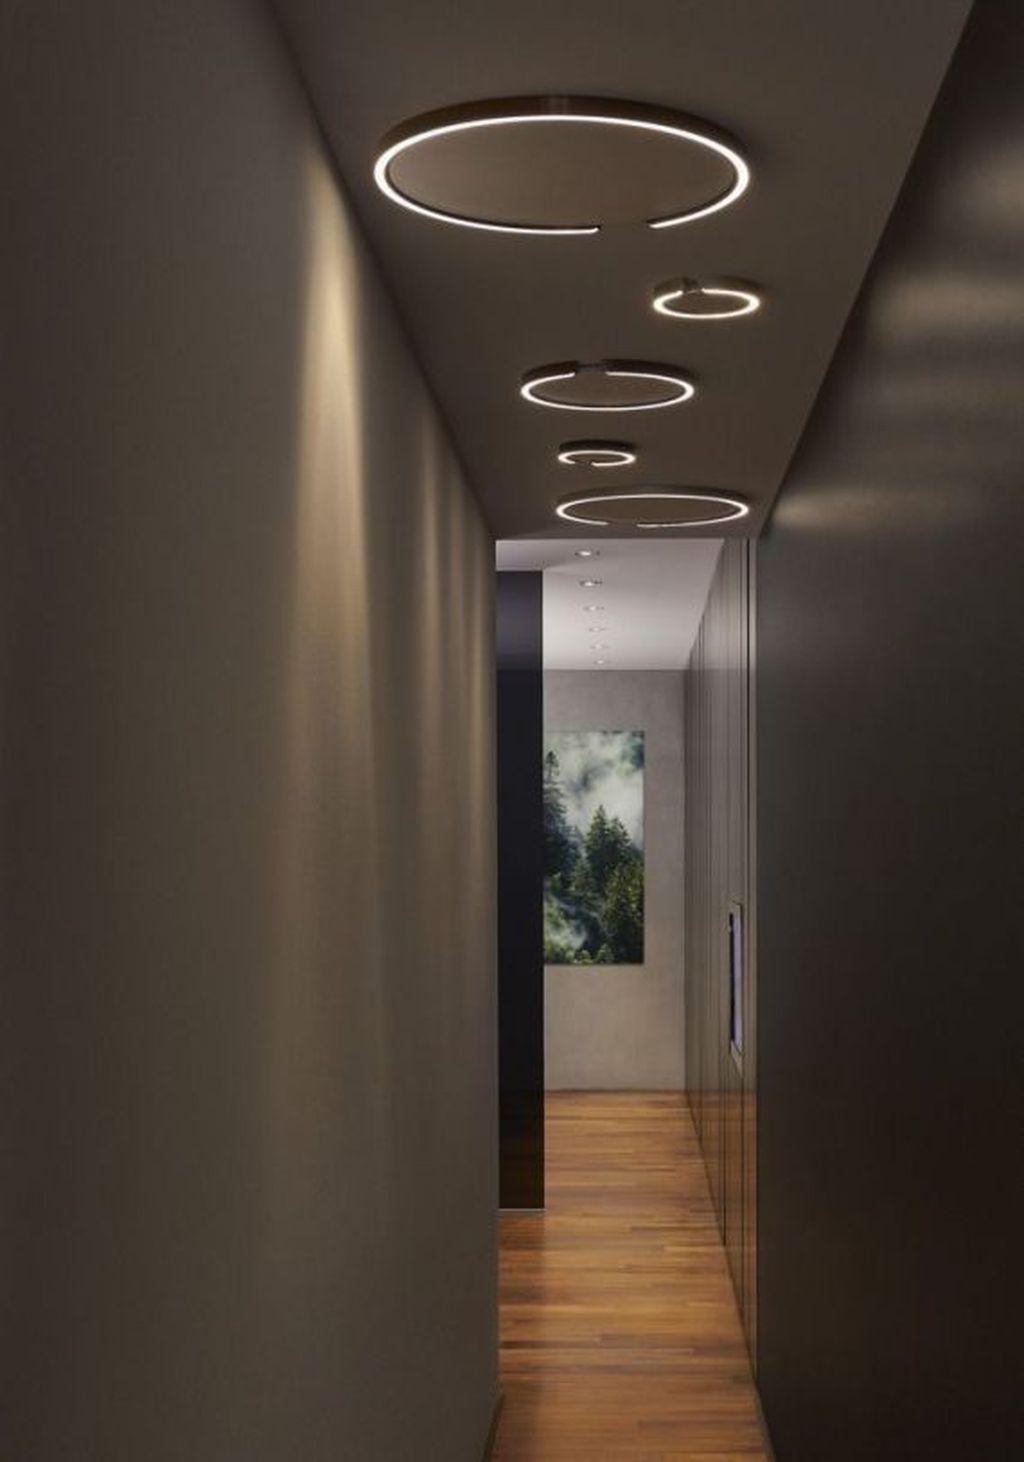 Get Home Design Ideas: 33 Casual Home Corridor Design Ideas For Your Home